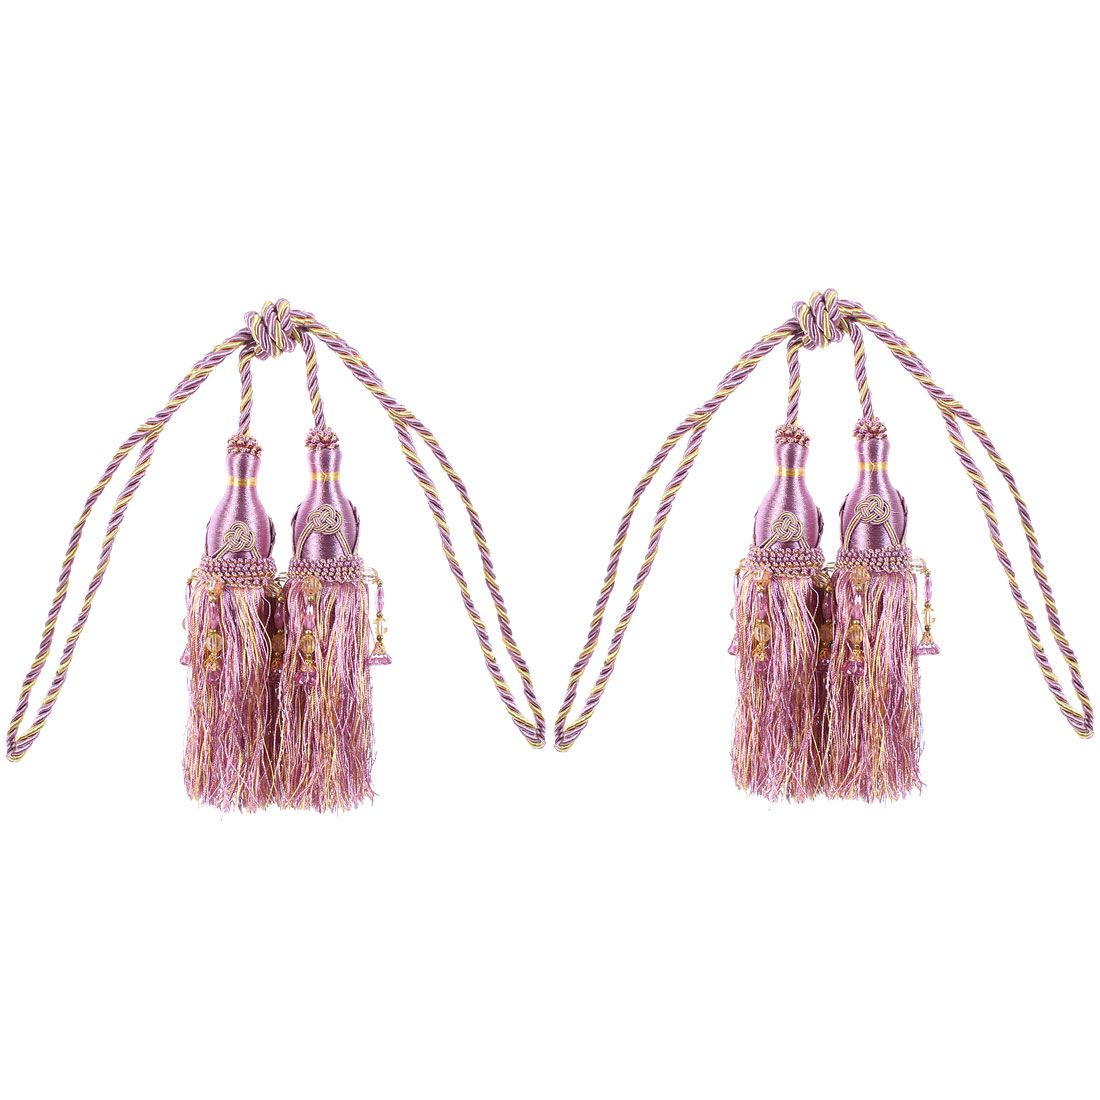 Curtain Drapery Hanging Beads Tassel Tiebacks 2Pcs